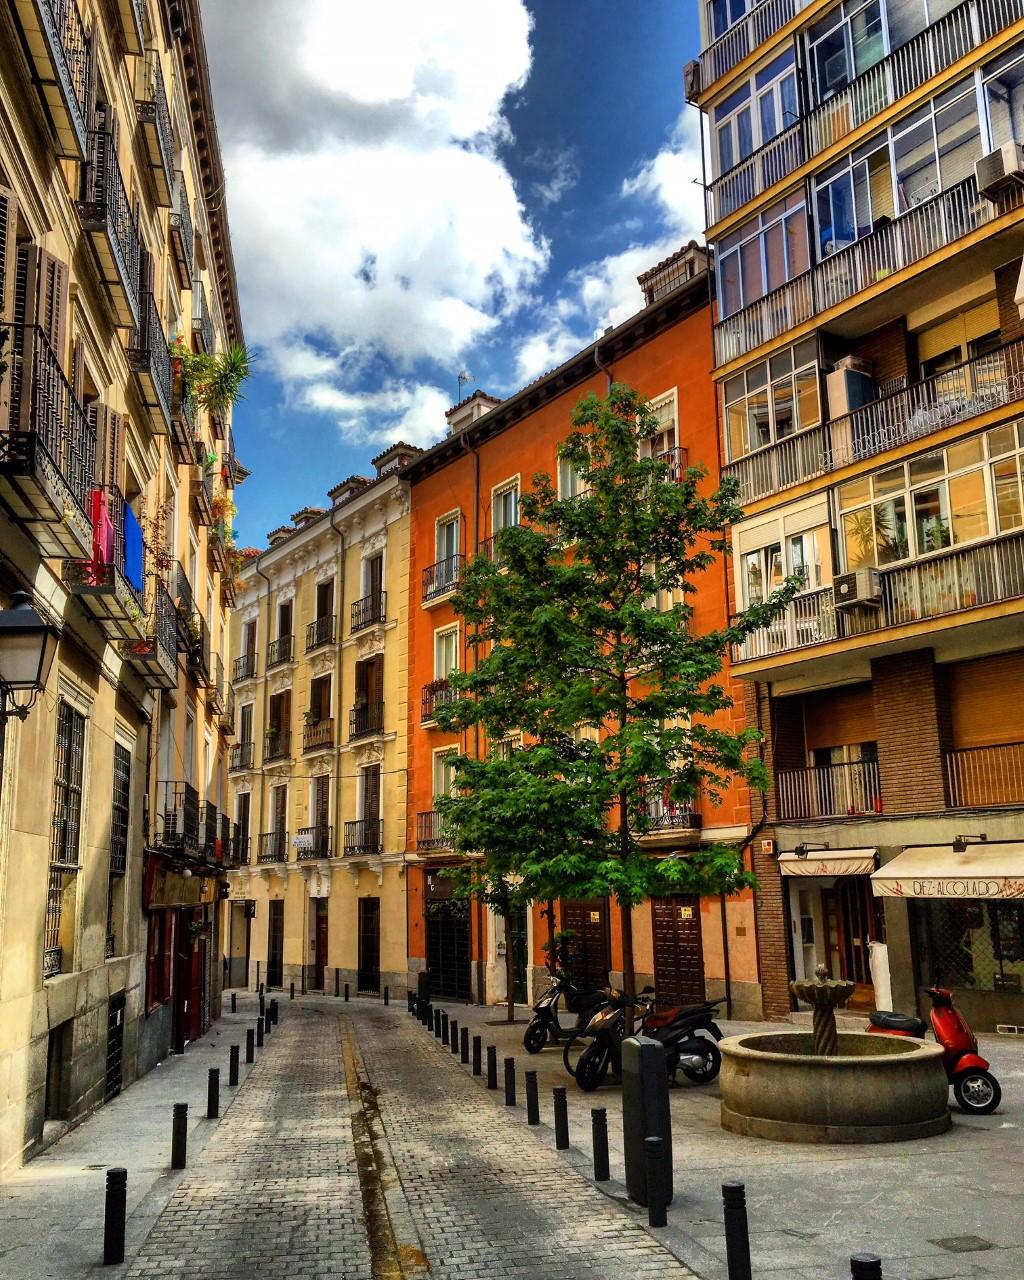 Calle del Espejo, Madrid